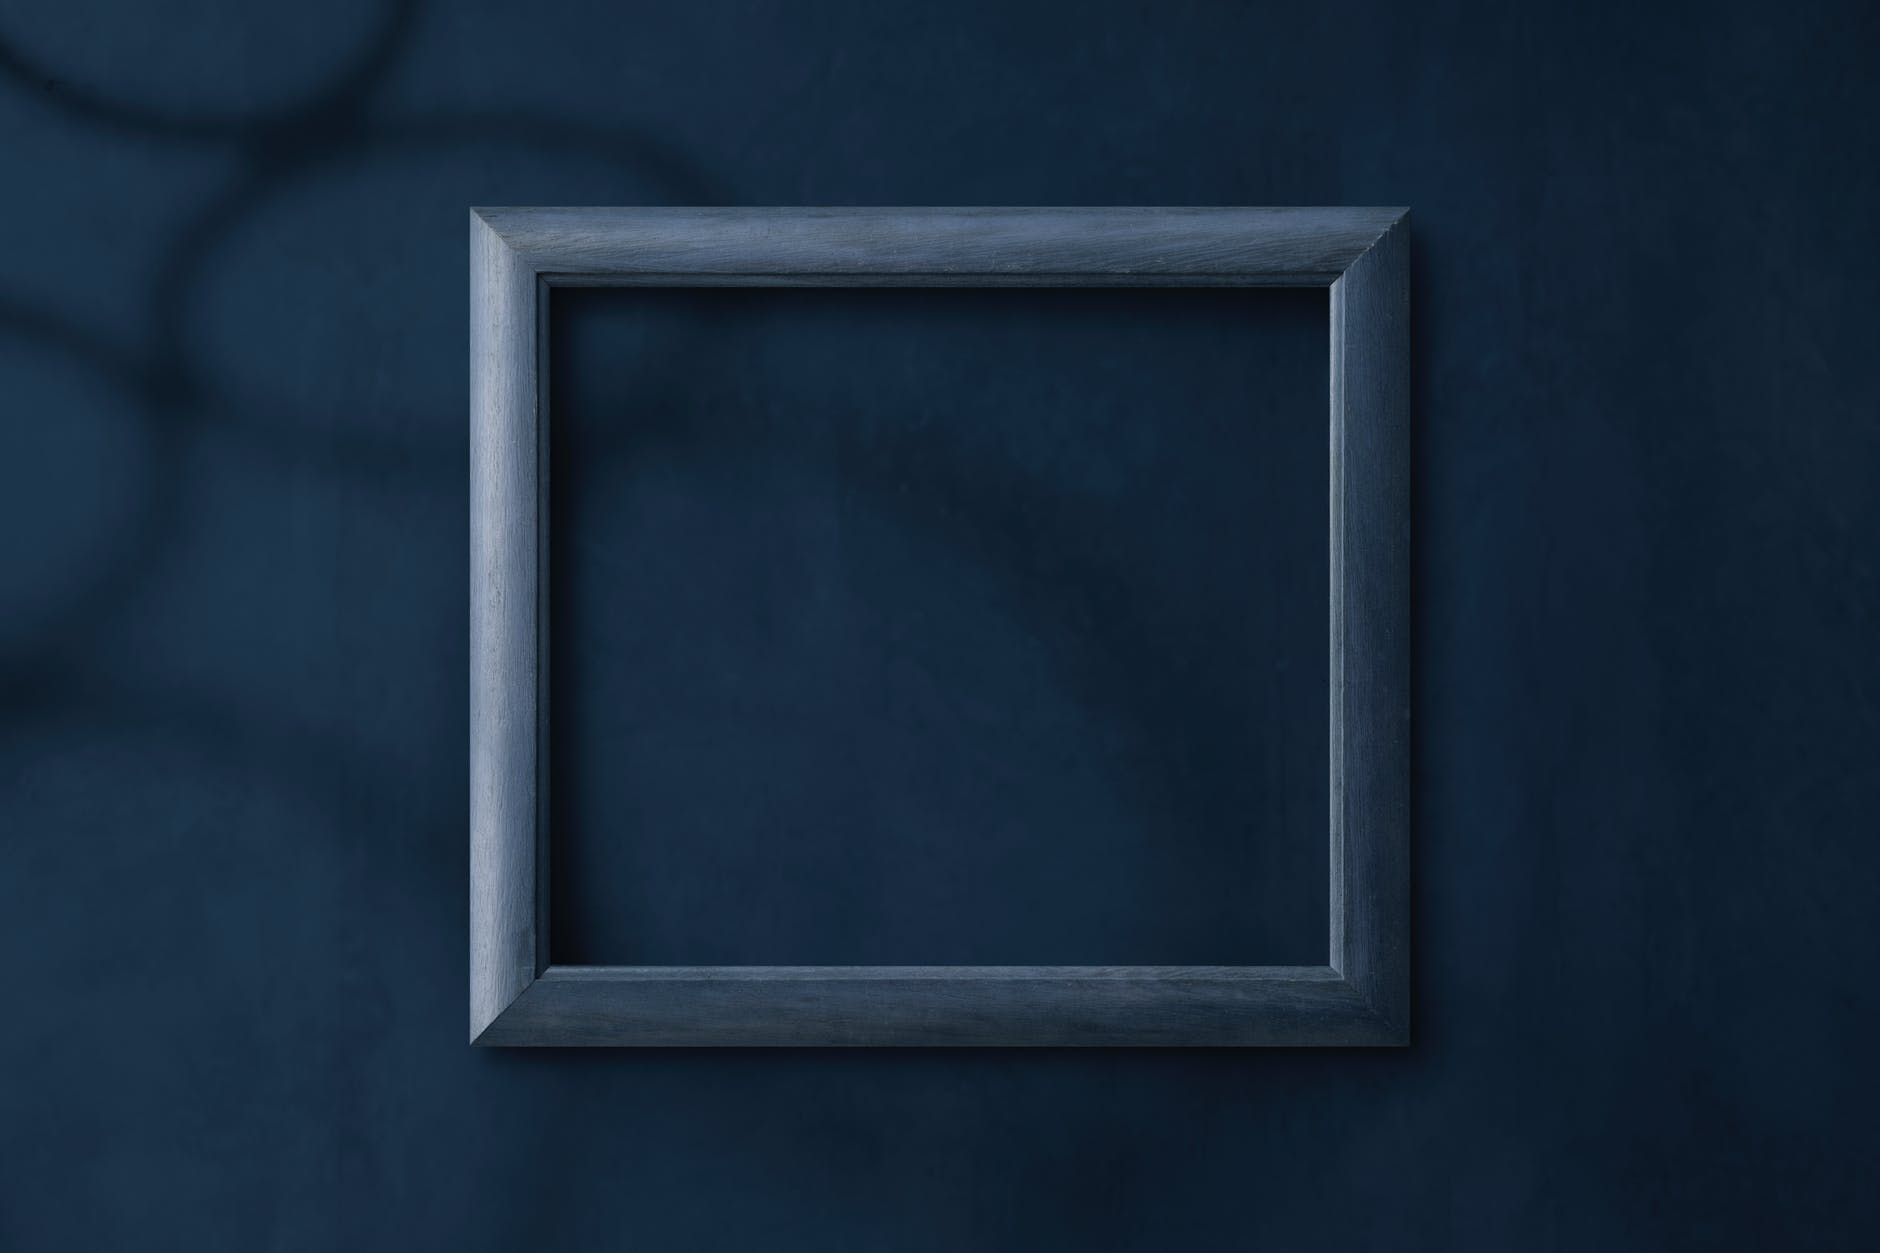 rectangular gray photo frame